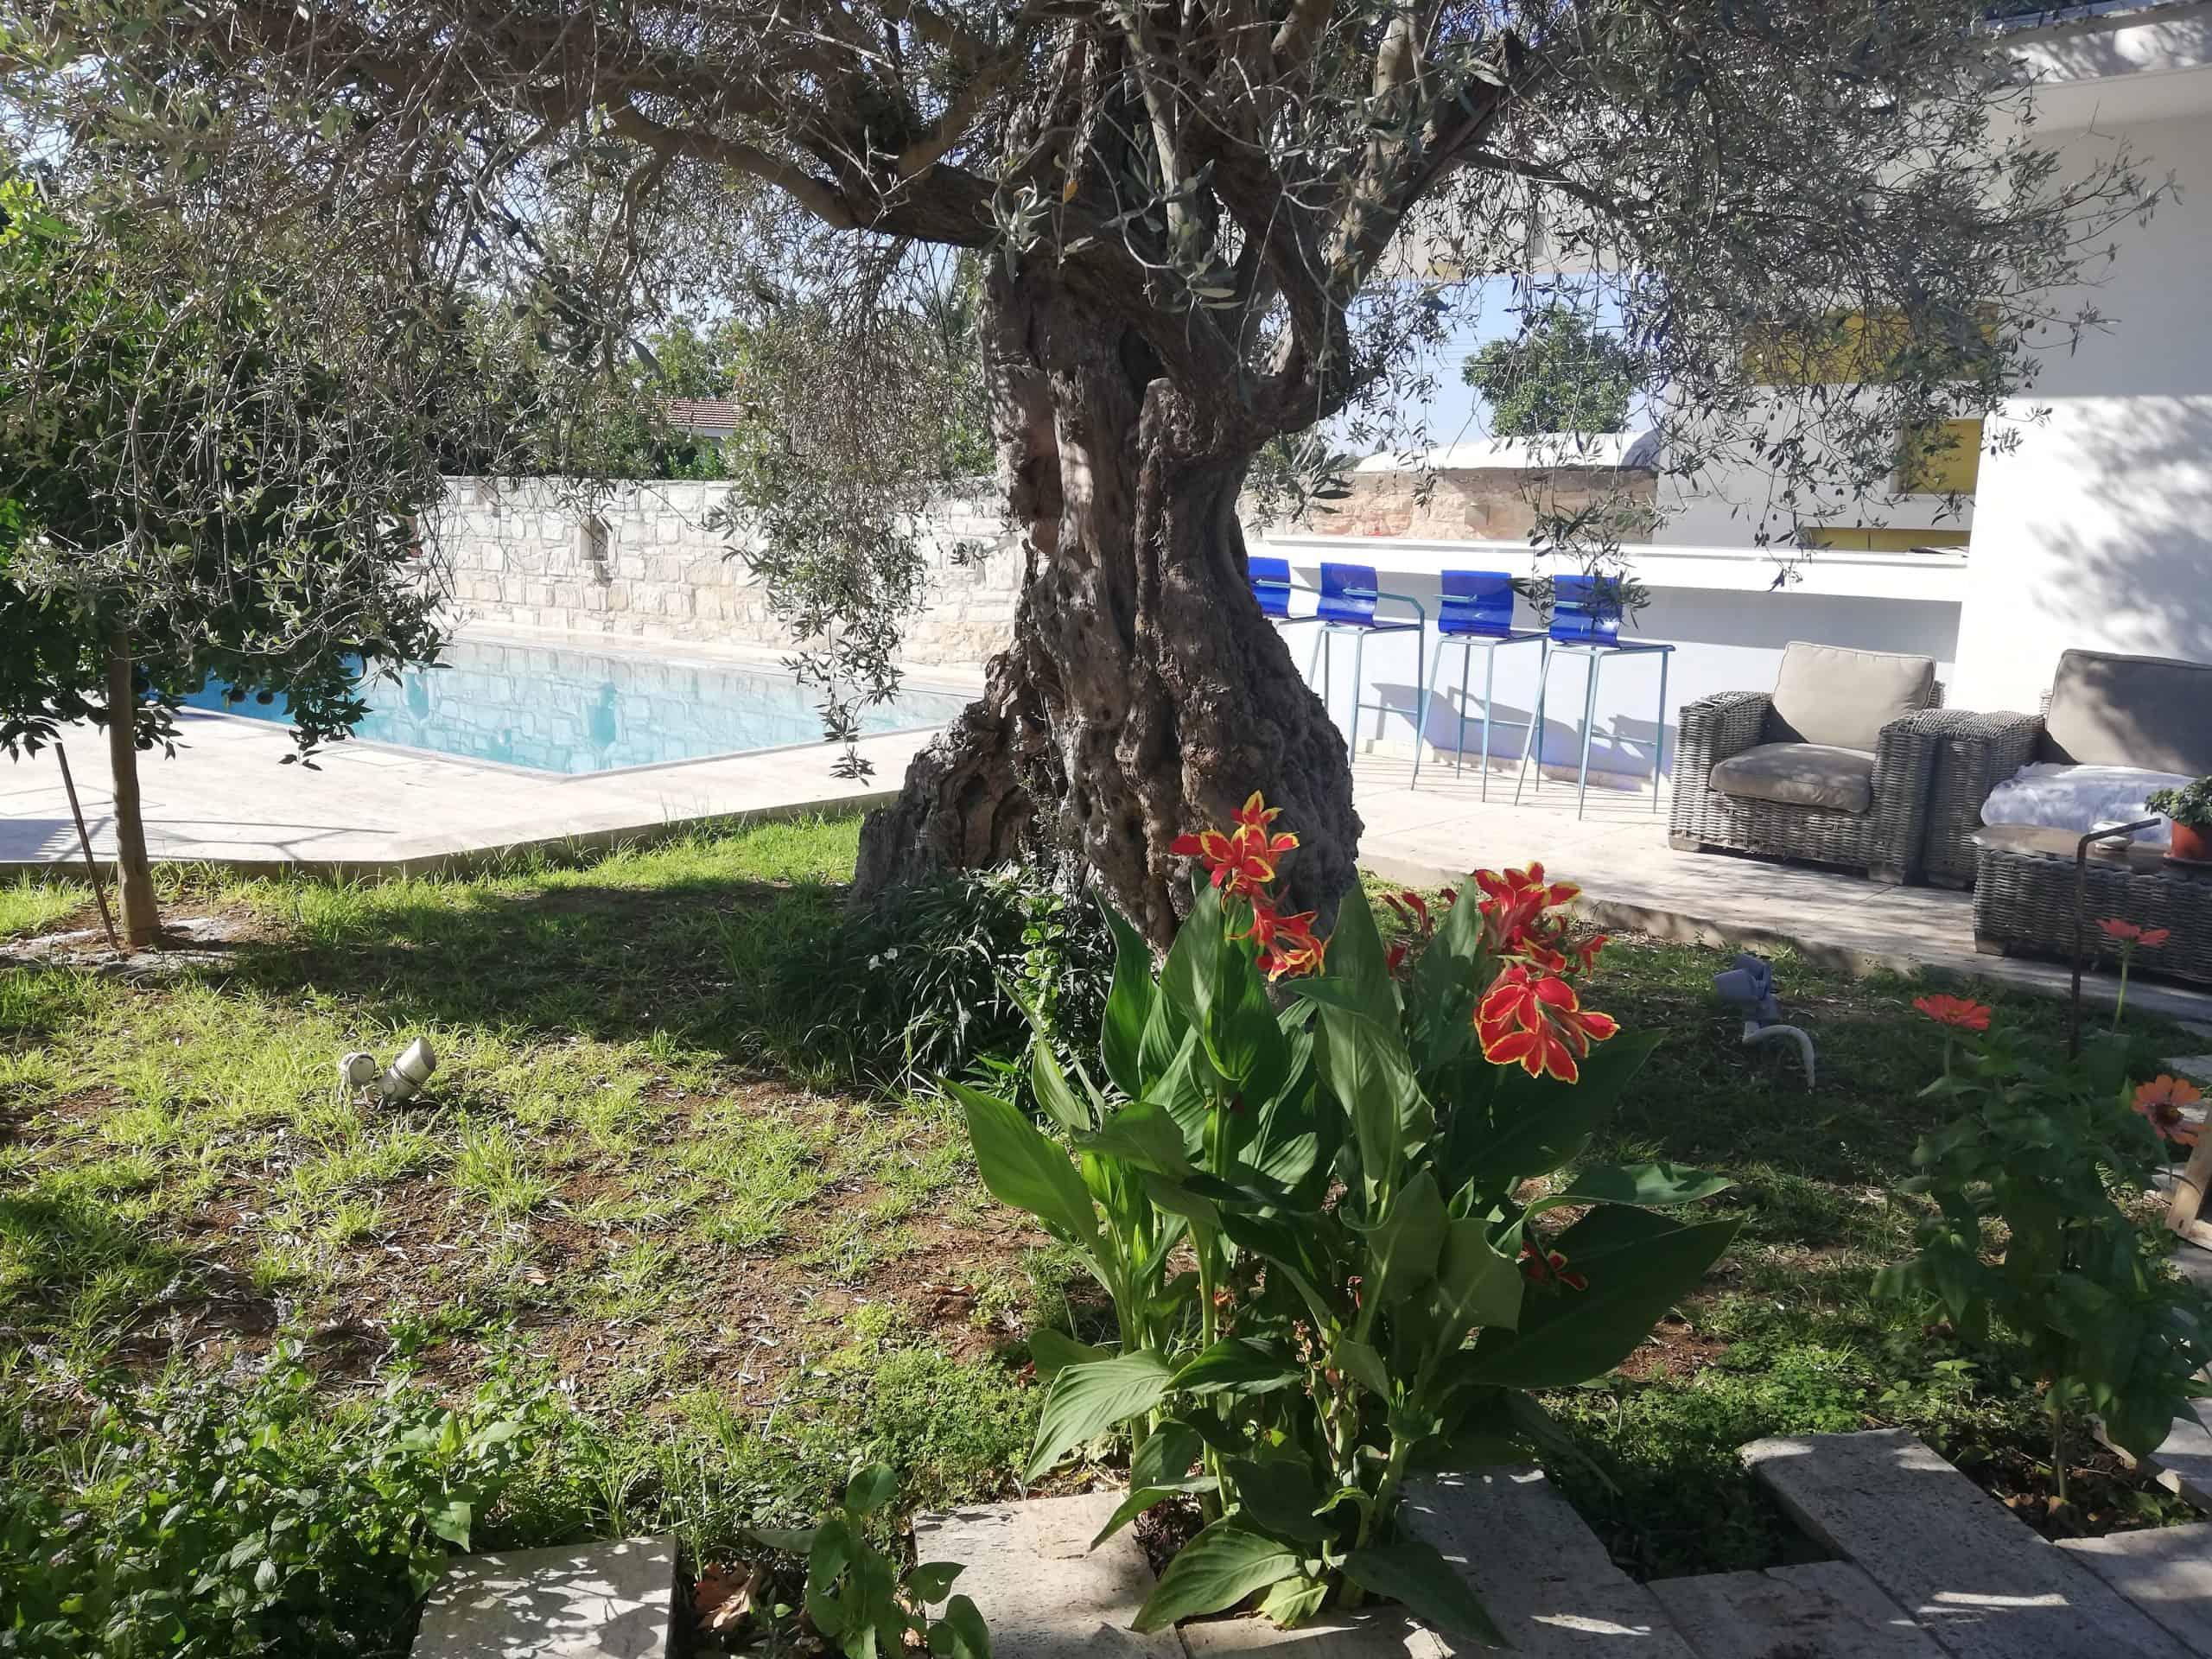 Kaizer Cyprus Agrotourism - IMG 20190821 085913 1 scaled